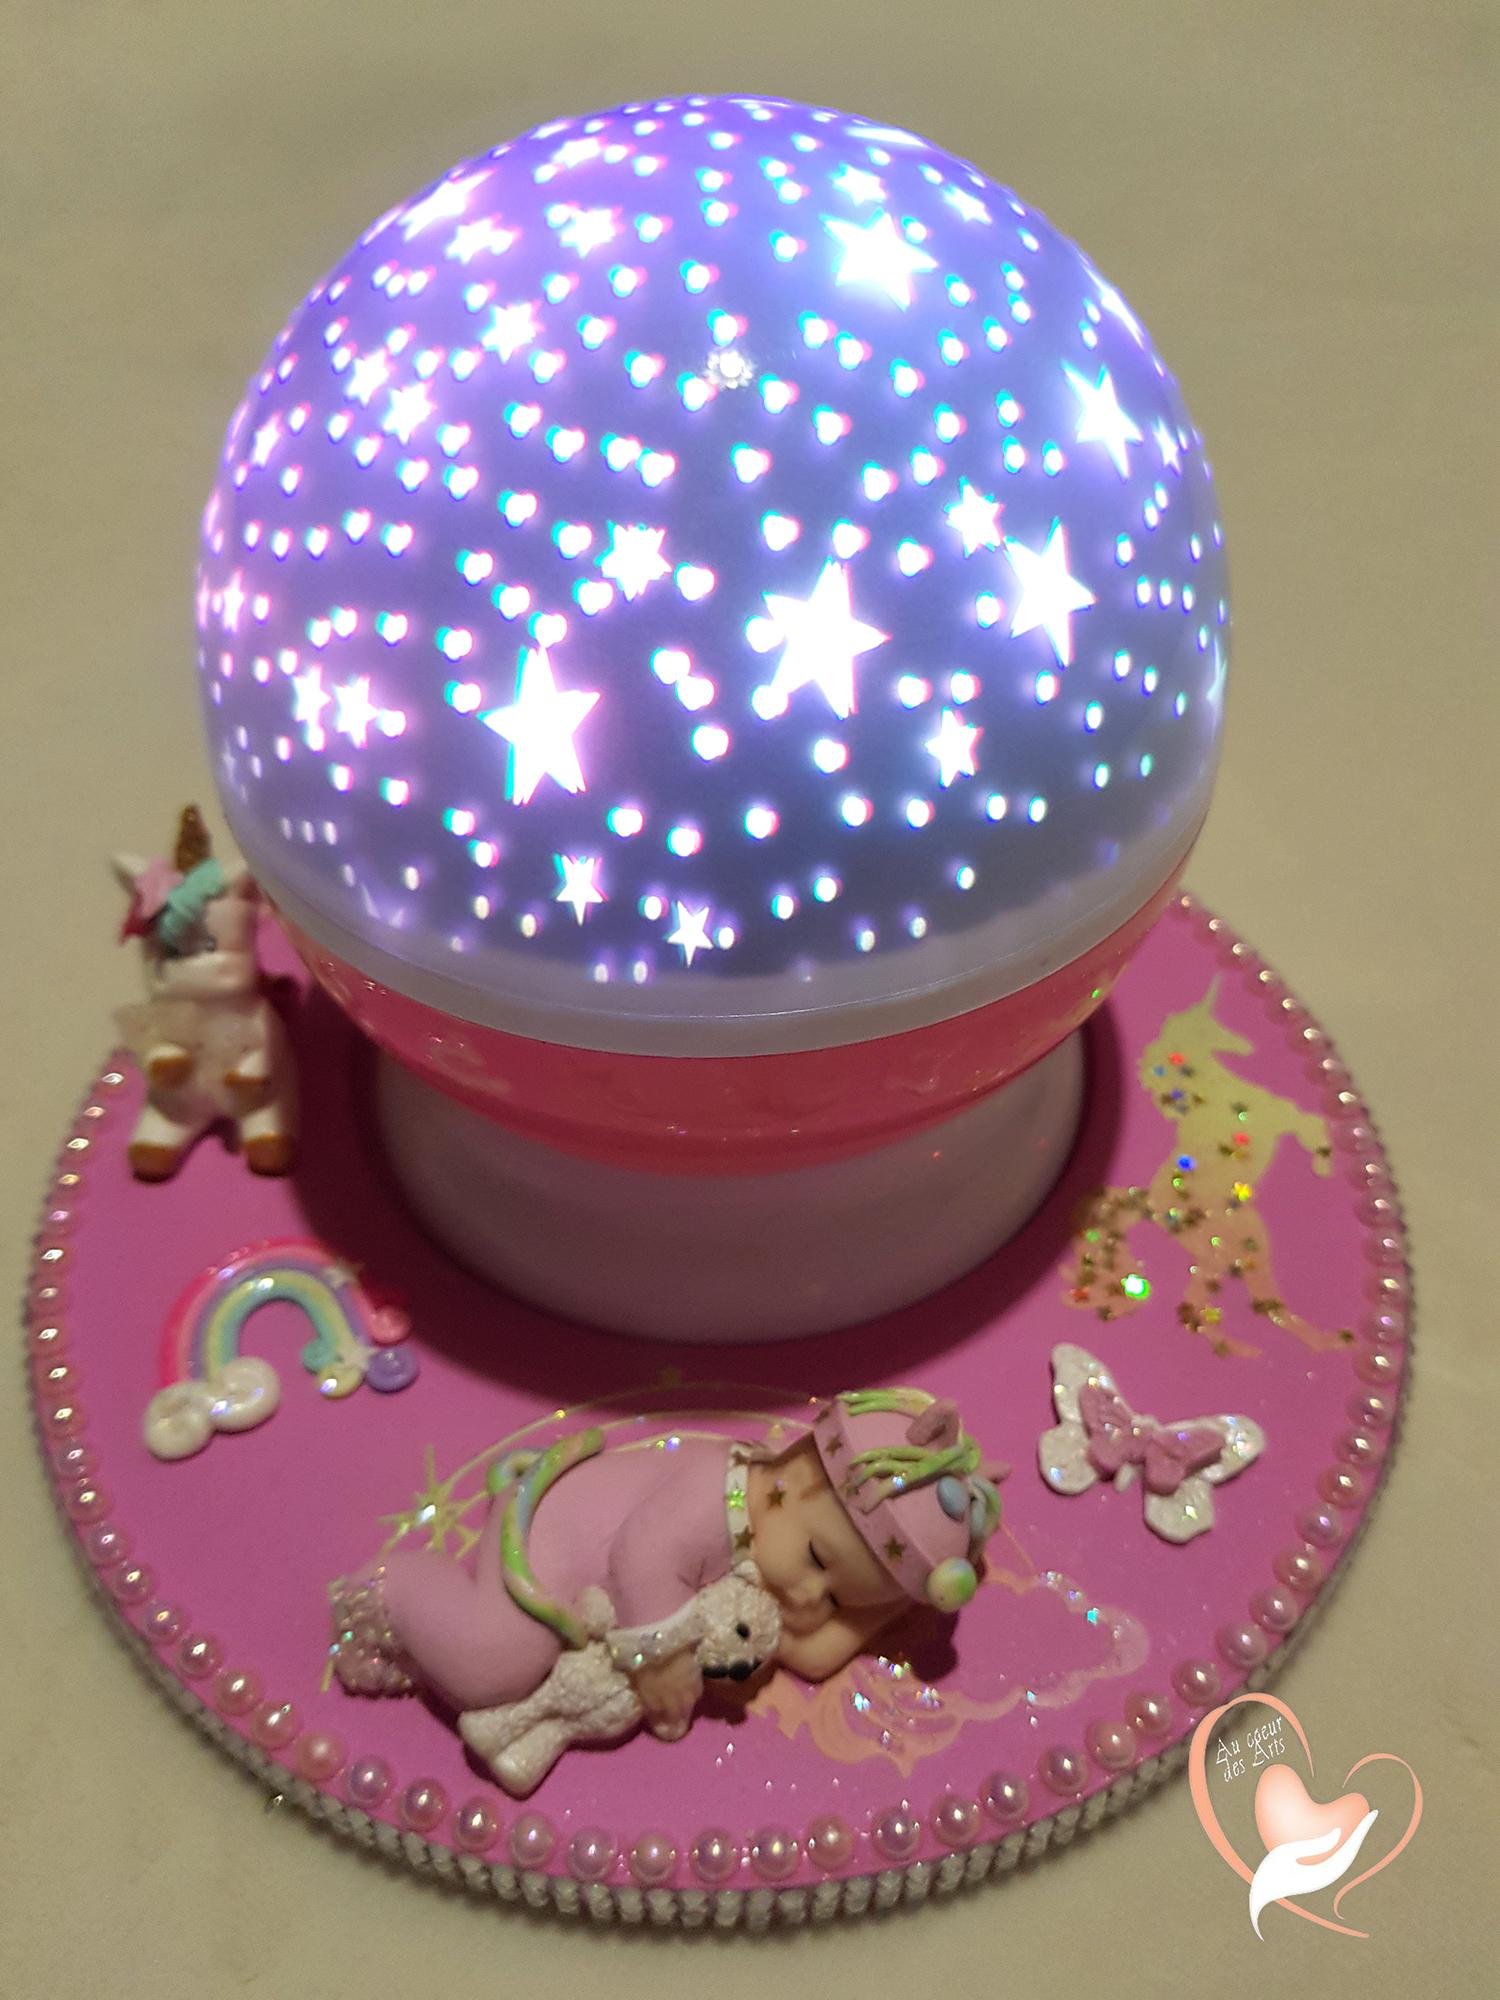 Bebe Rose Étoilé Veilleuse Lumineuse Sur En Bois Lampe Ciel Socle K35TlJuF1c